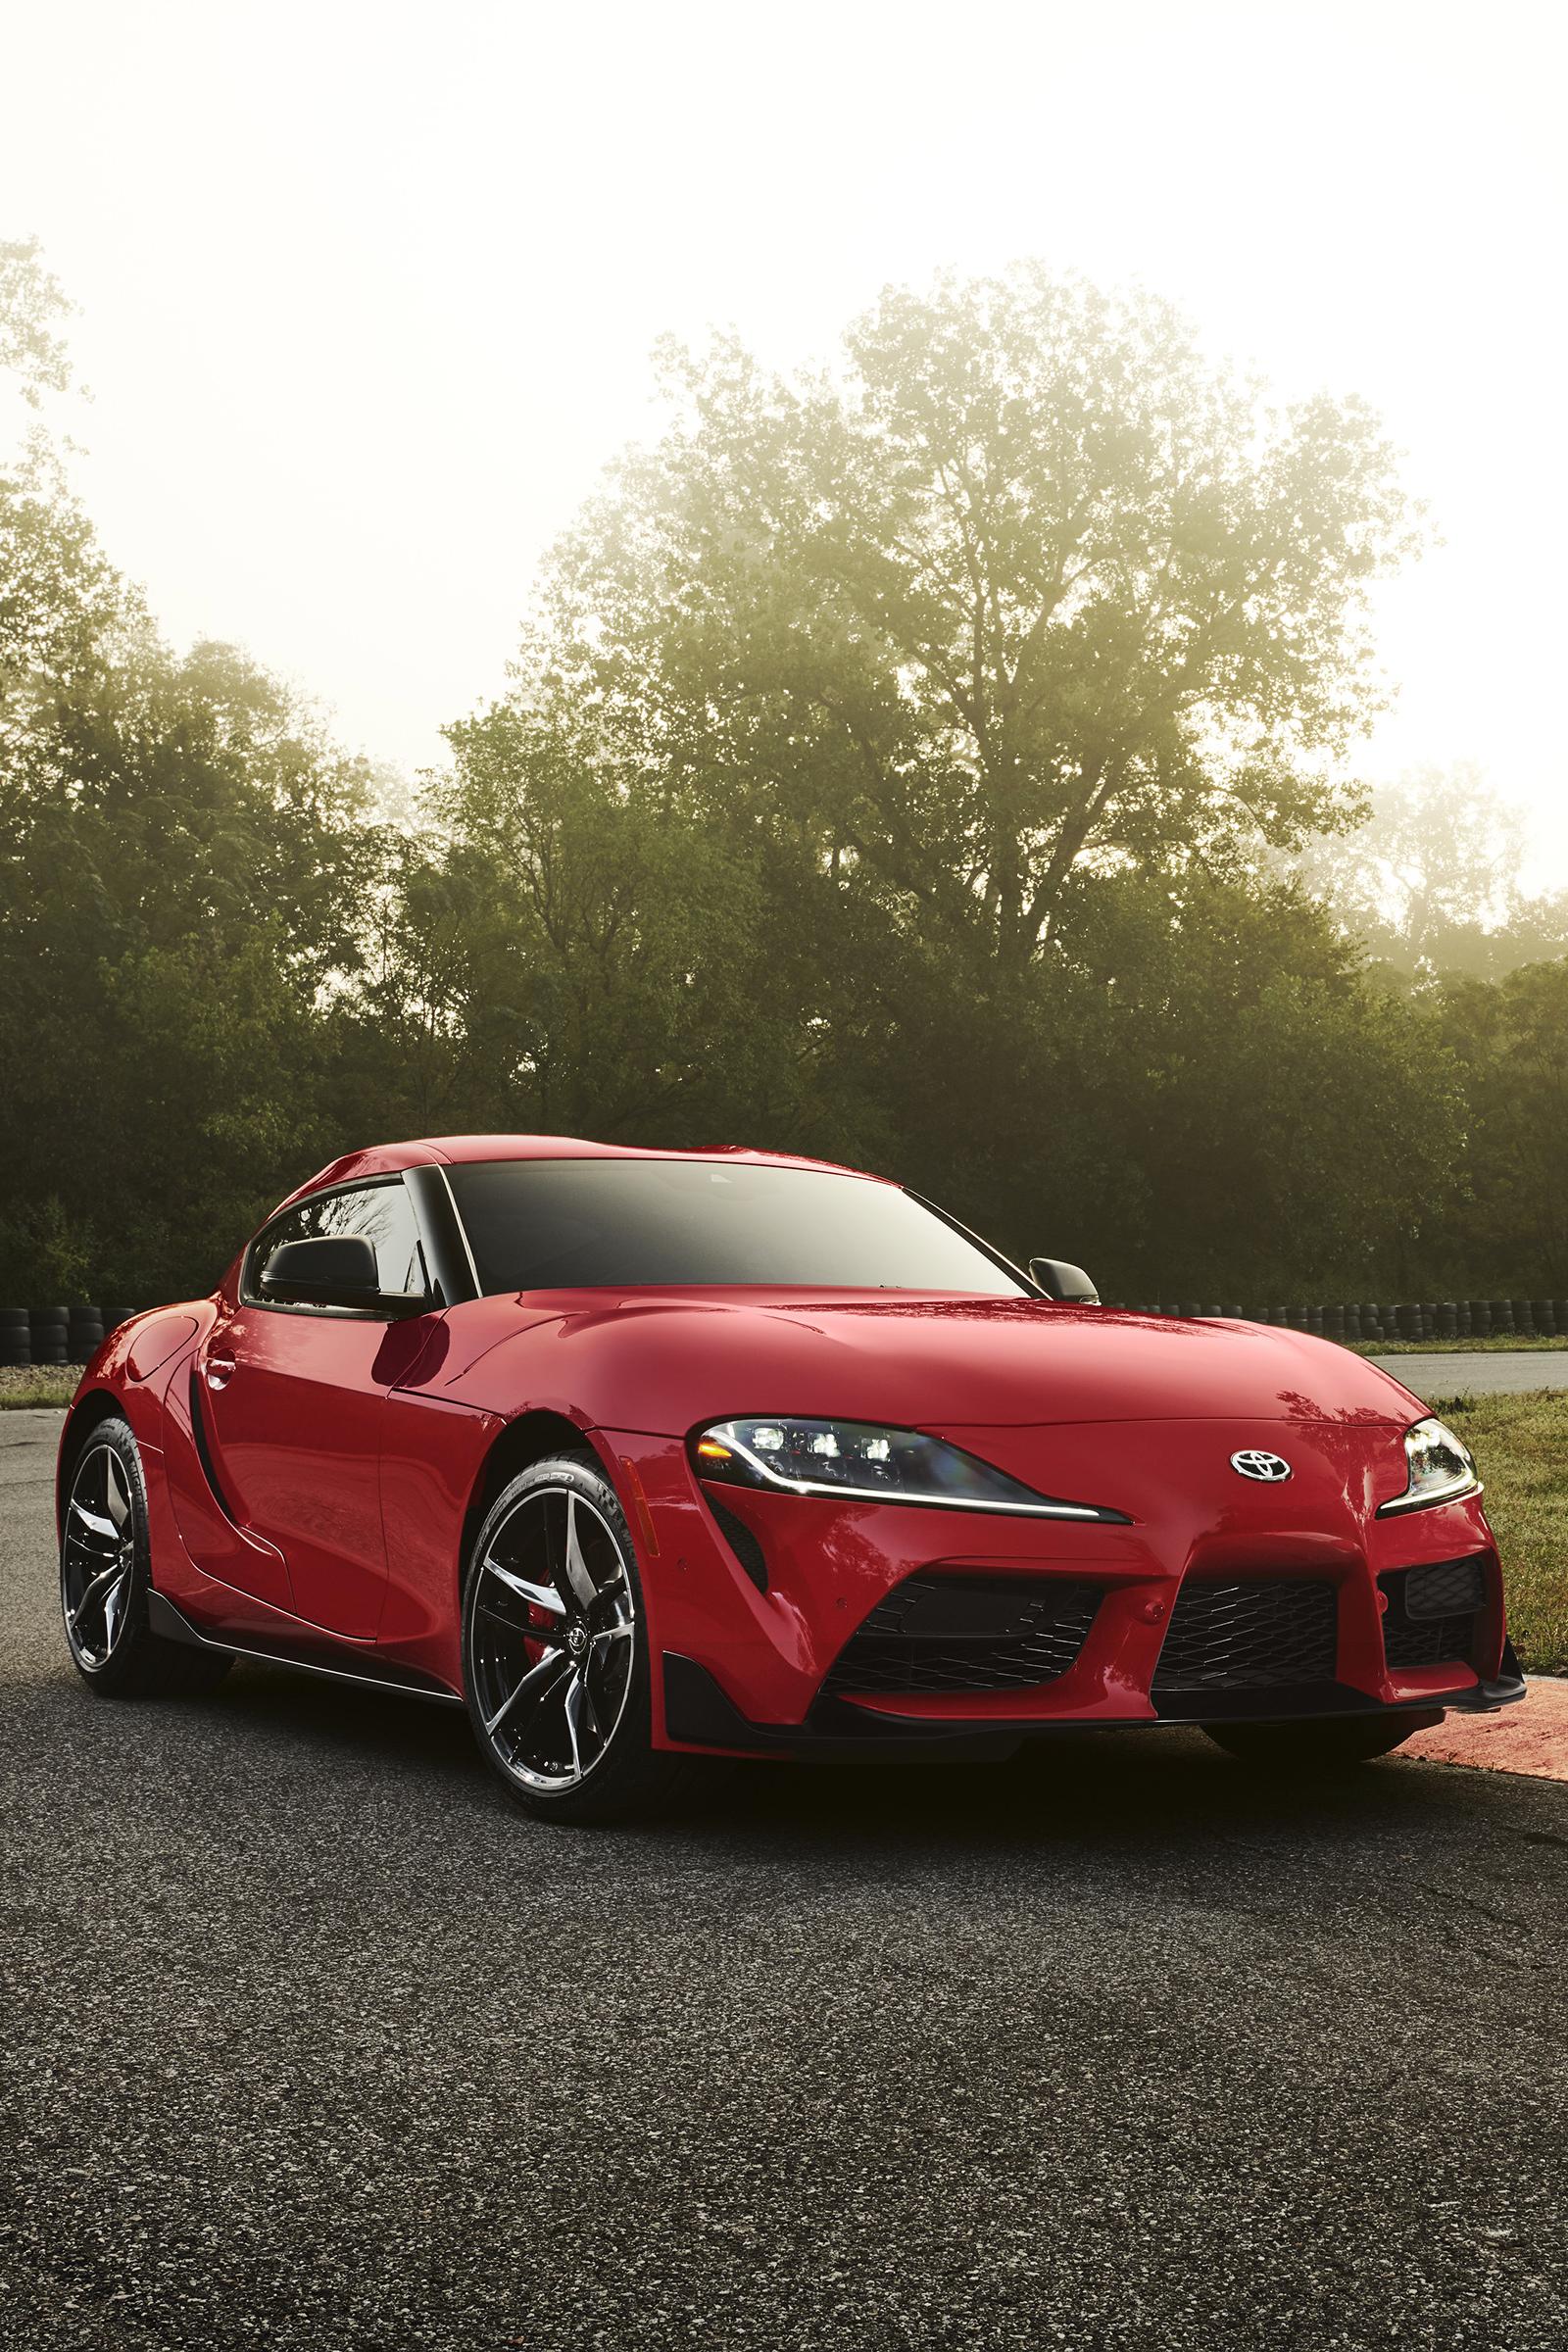 2020 Toyota Gr Supra Looks Stunning The Man Premium Cars Toyota Toyota Supra